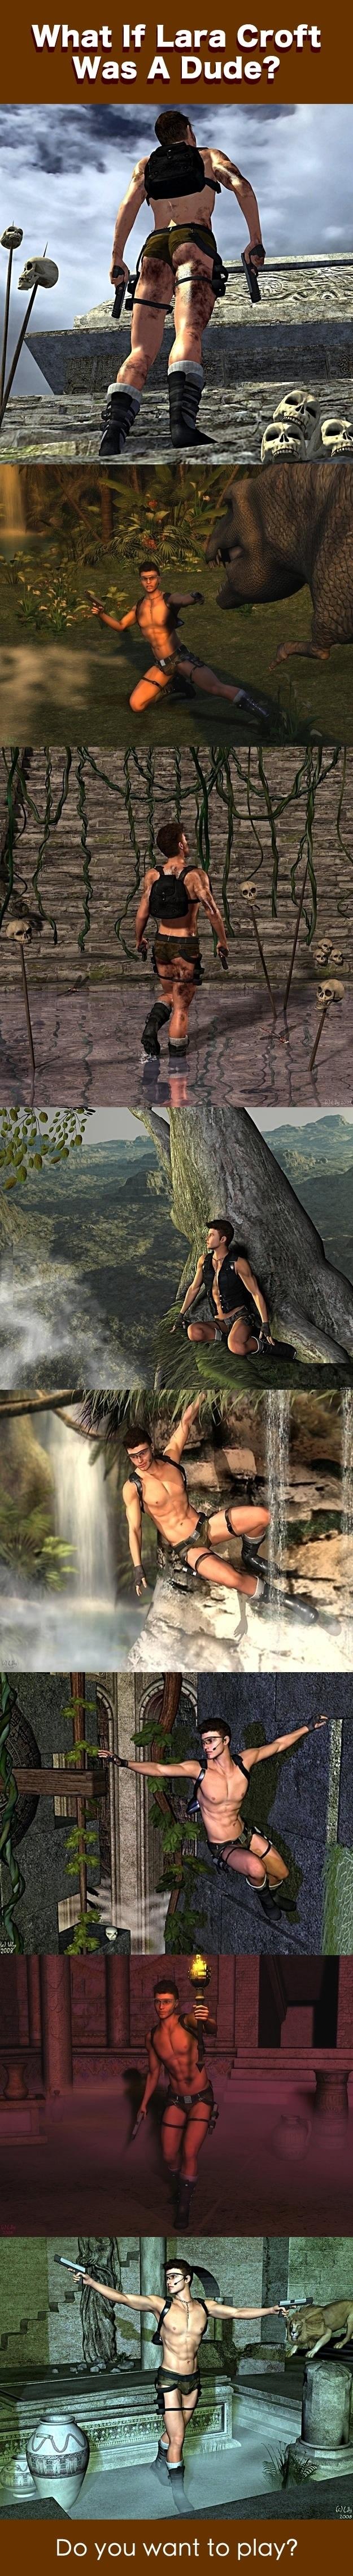 Mr. Lara Croft